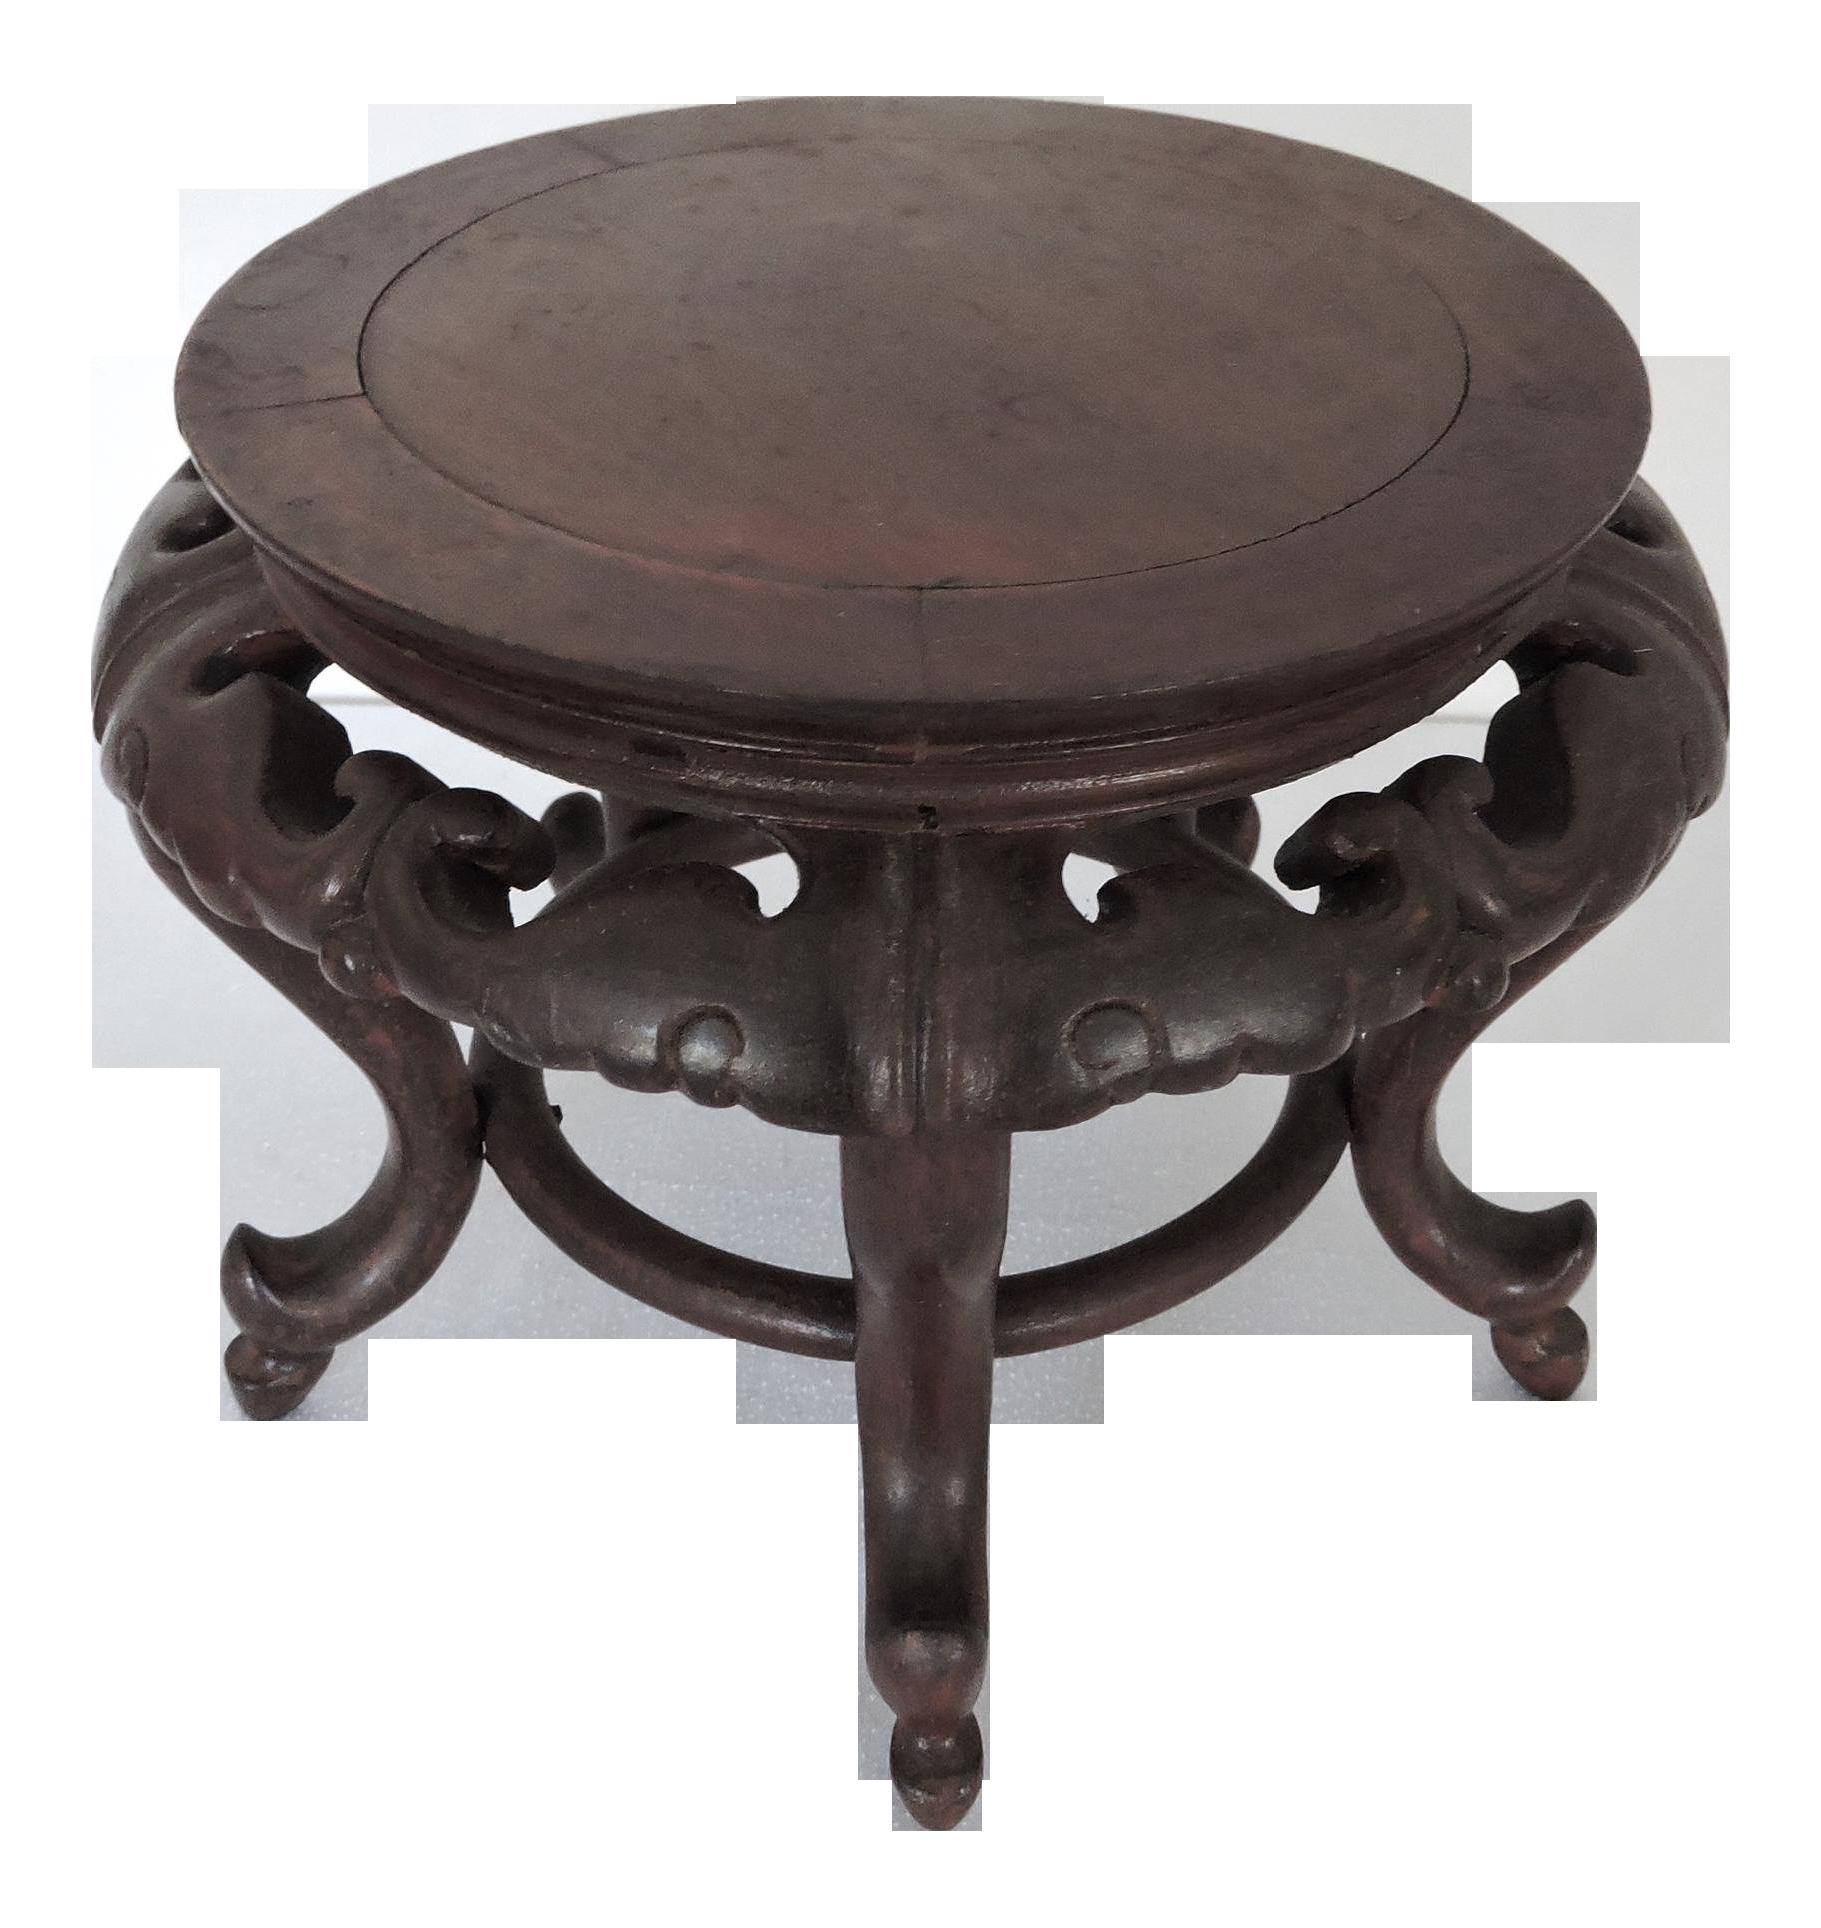 Vintage Chinese Carved Red Rosewood Bat Ornament Pedestal Or Display Stand 7 8 6 4 Carving Vintage Display Stand [ 1928 x 1821 Pixel ]